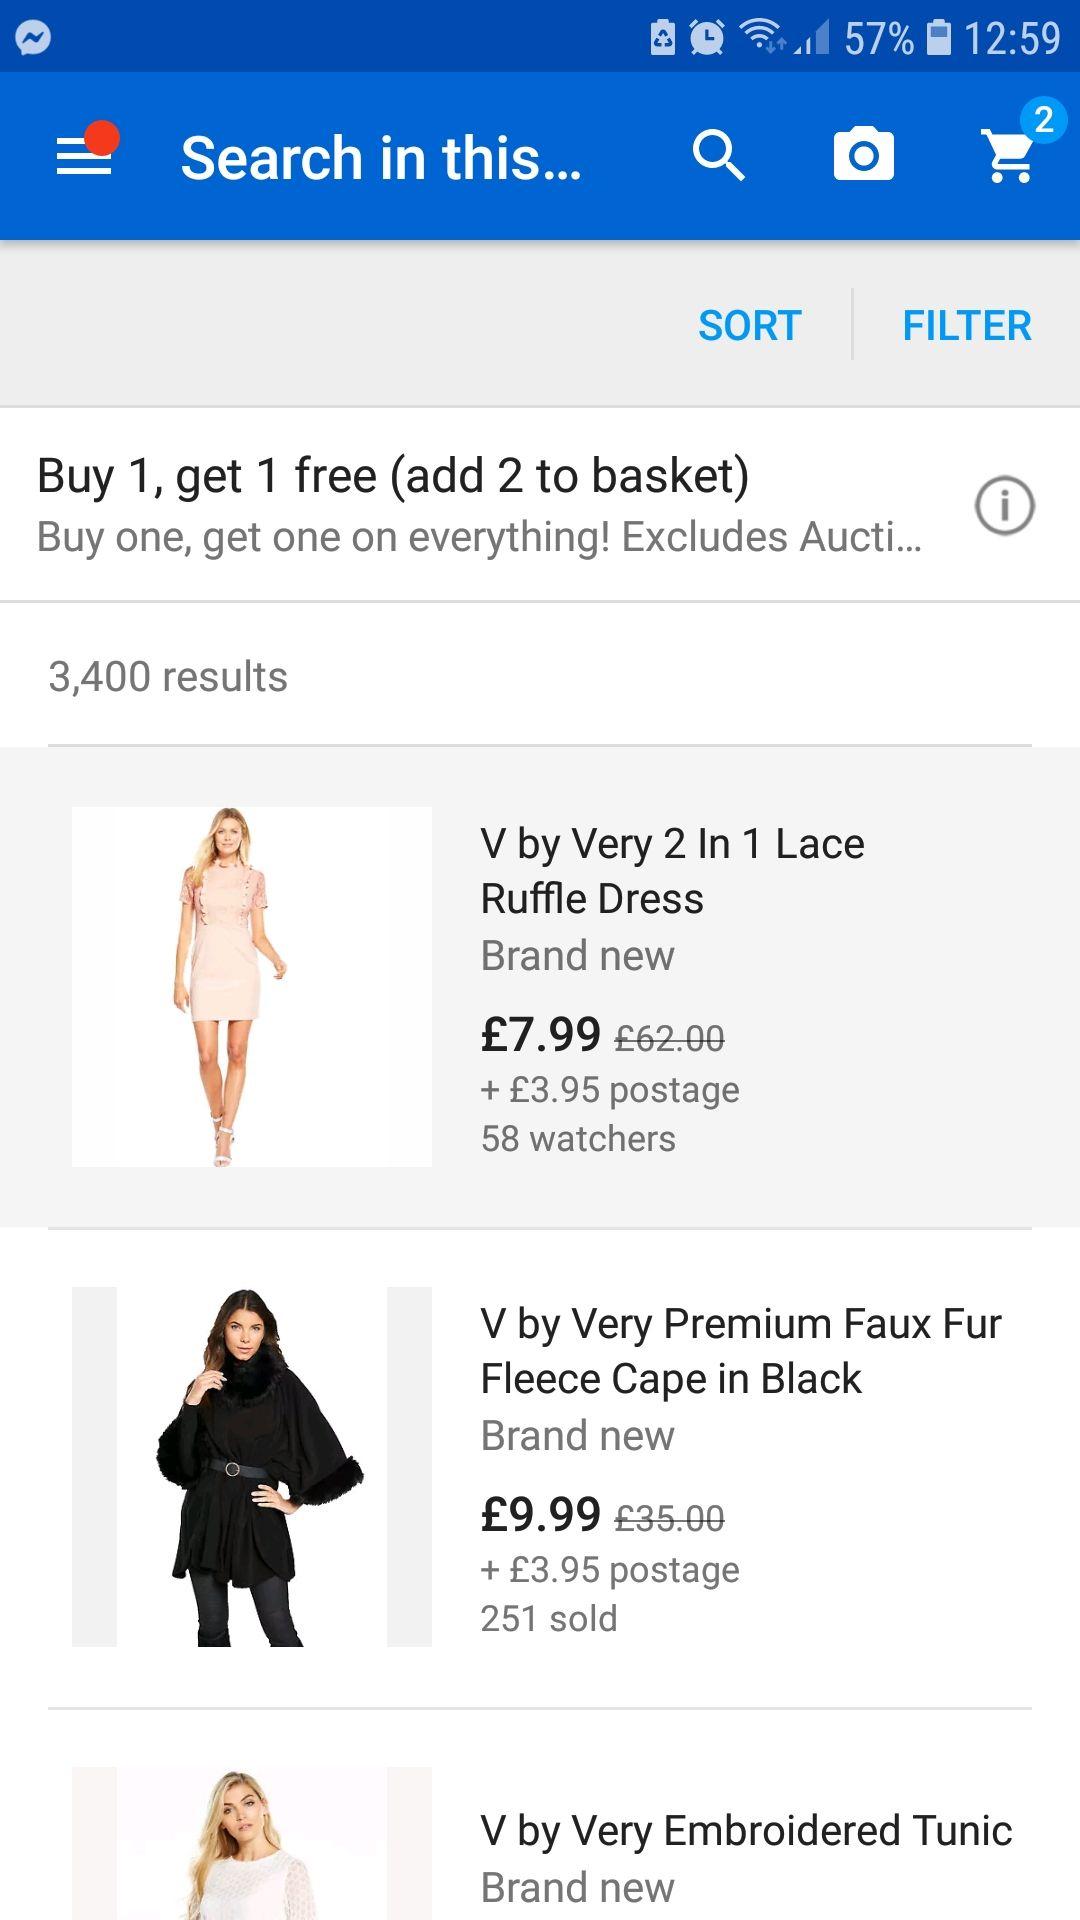 Very EBay Clearance BOGOF Offer Gift Toys Women's Kids Shoes Uniform